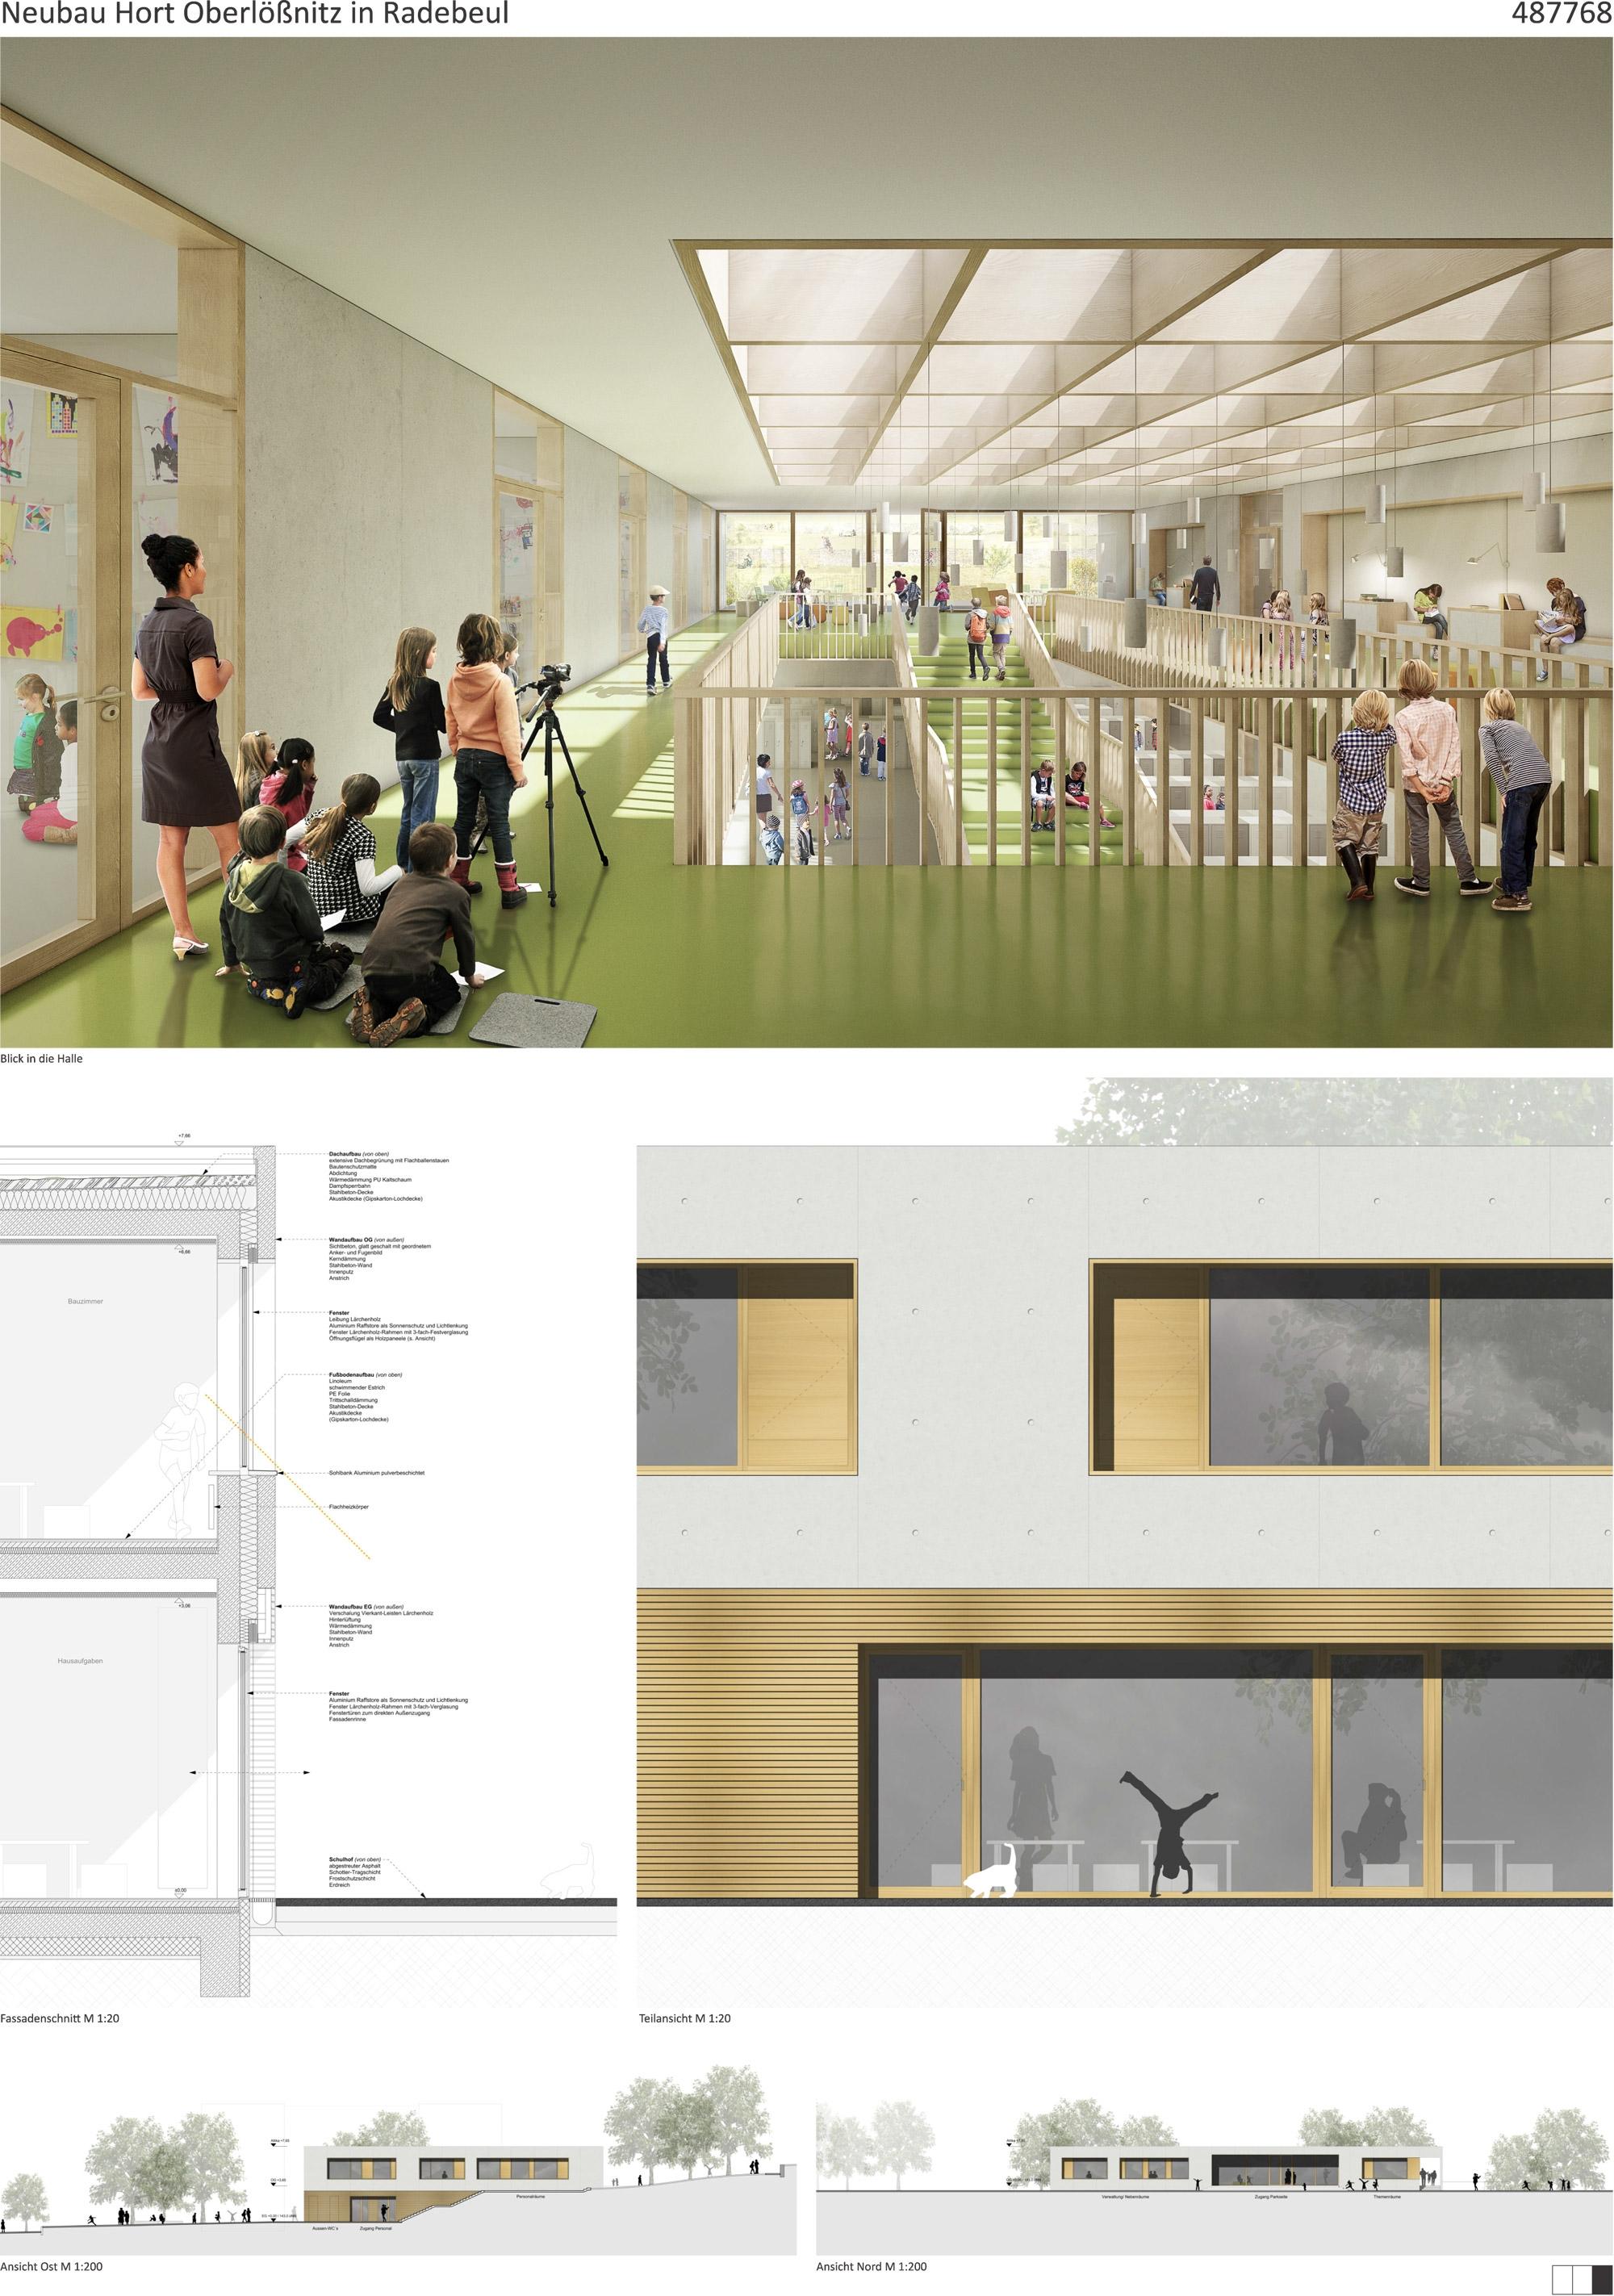 Architekt Radebeul ergebnis neubau hort oberlößnitz competitionline